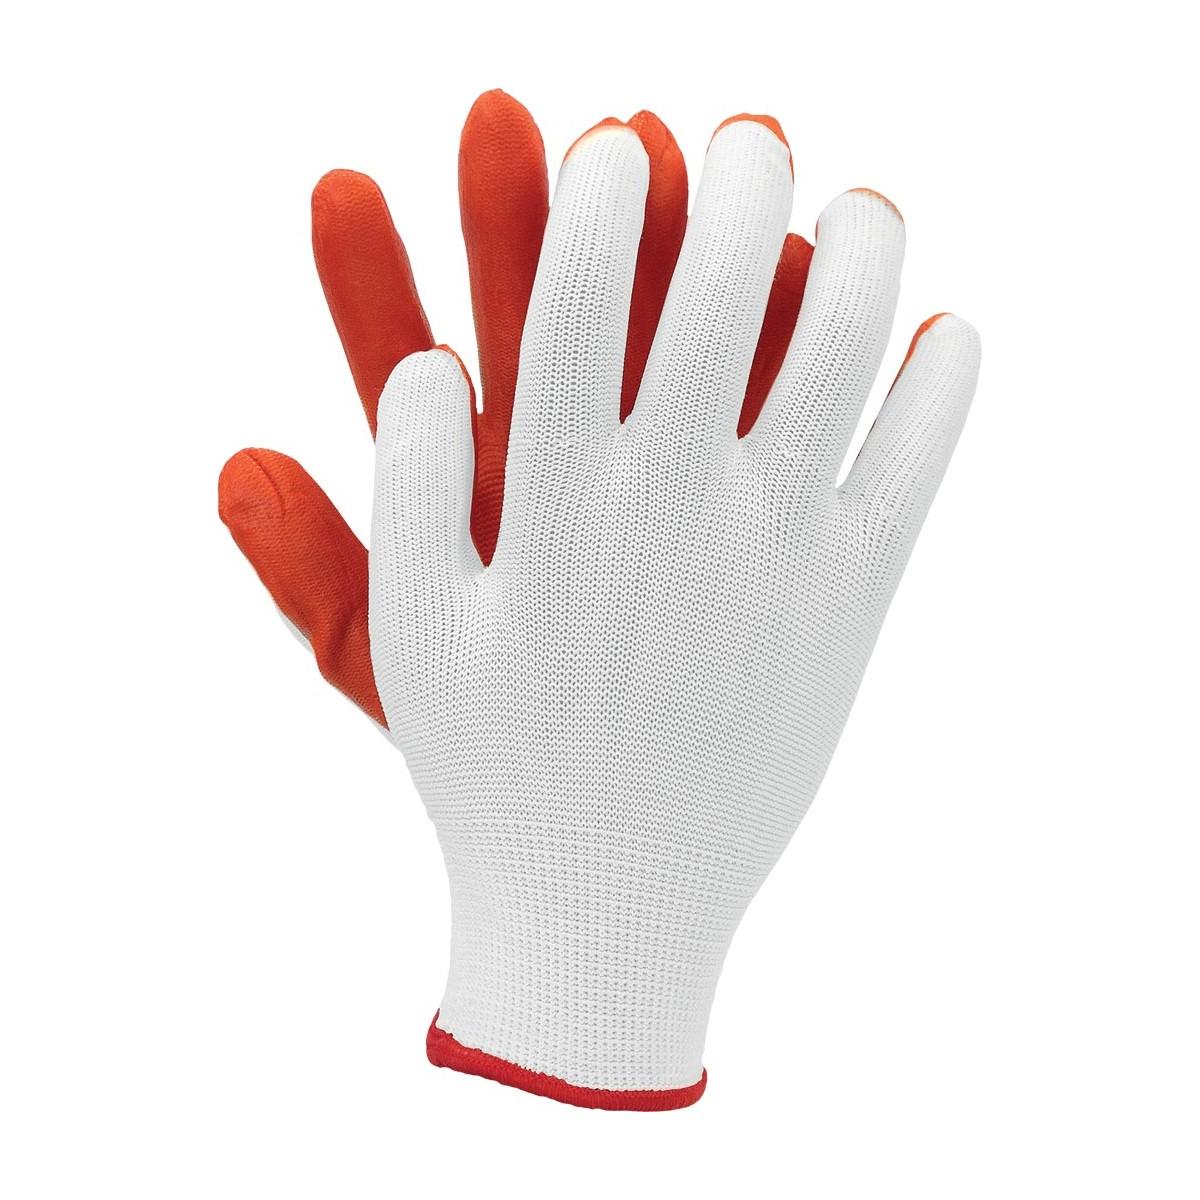 Rękawice robocze OX LATUA powlekane latexem r. L